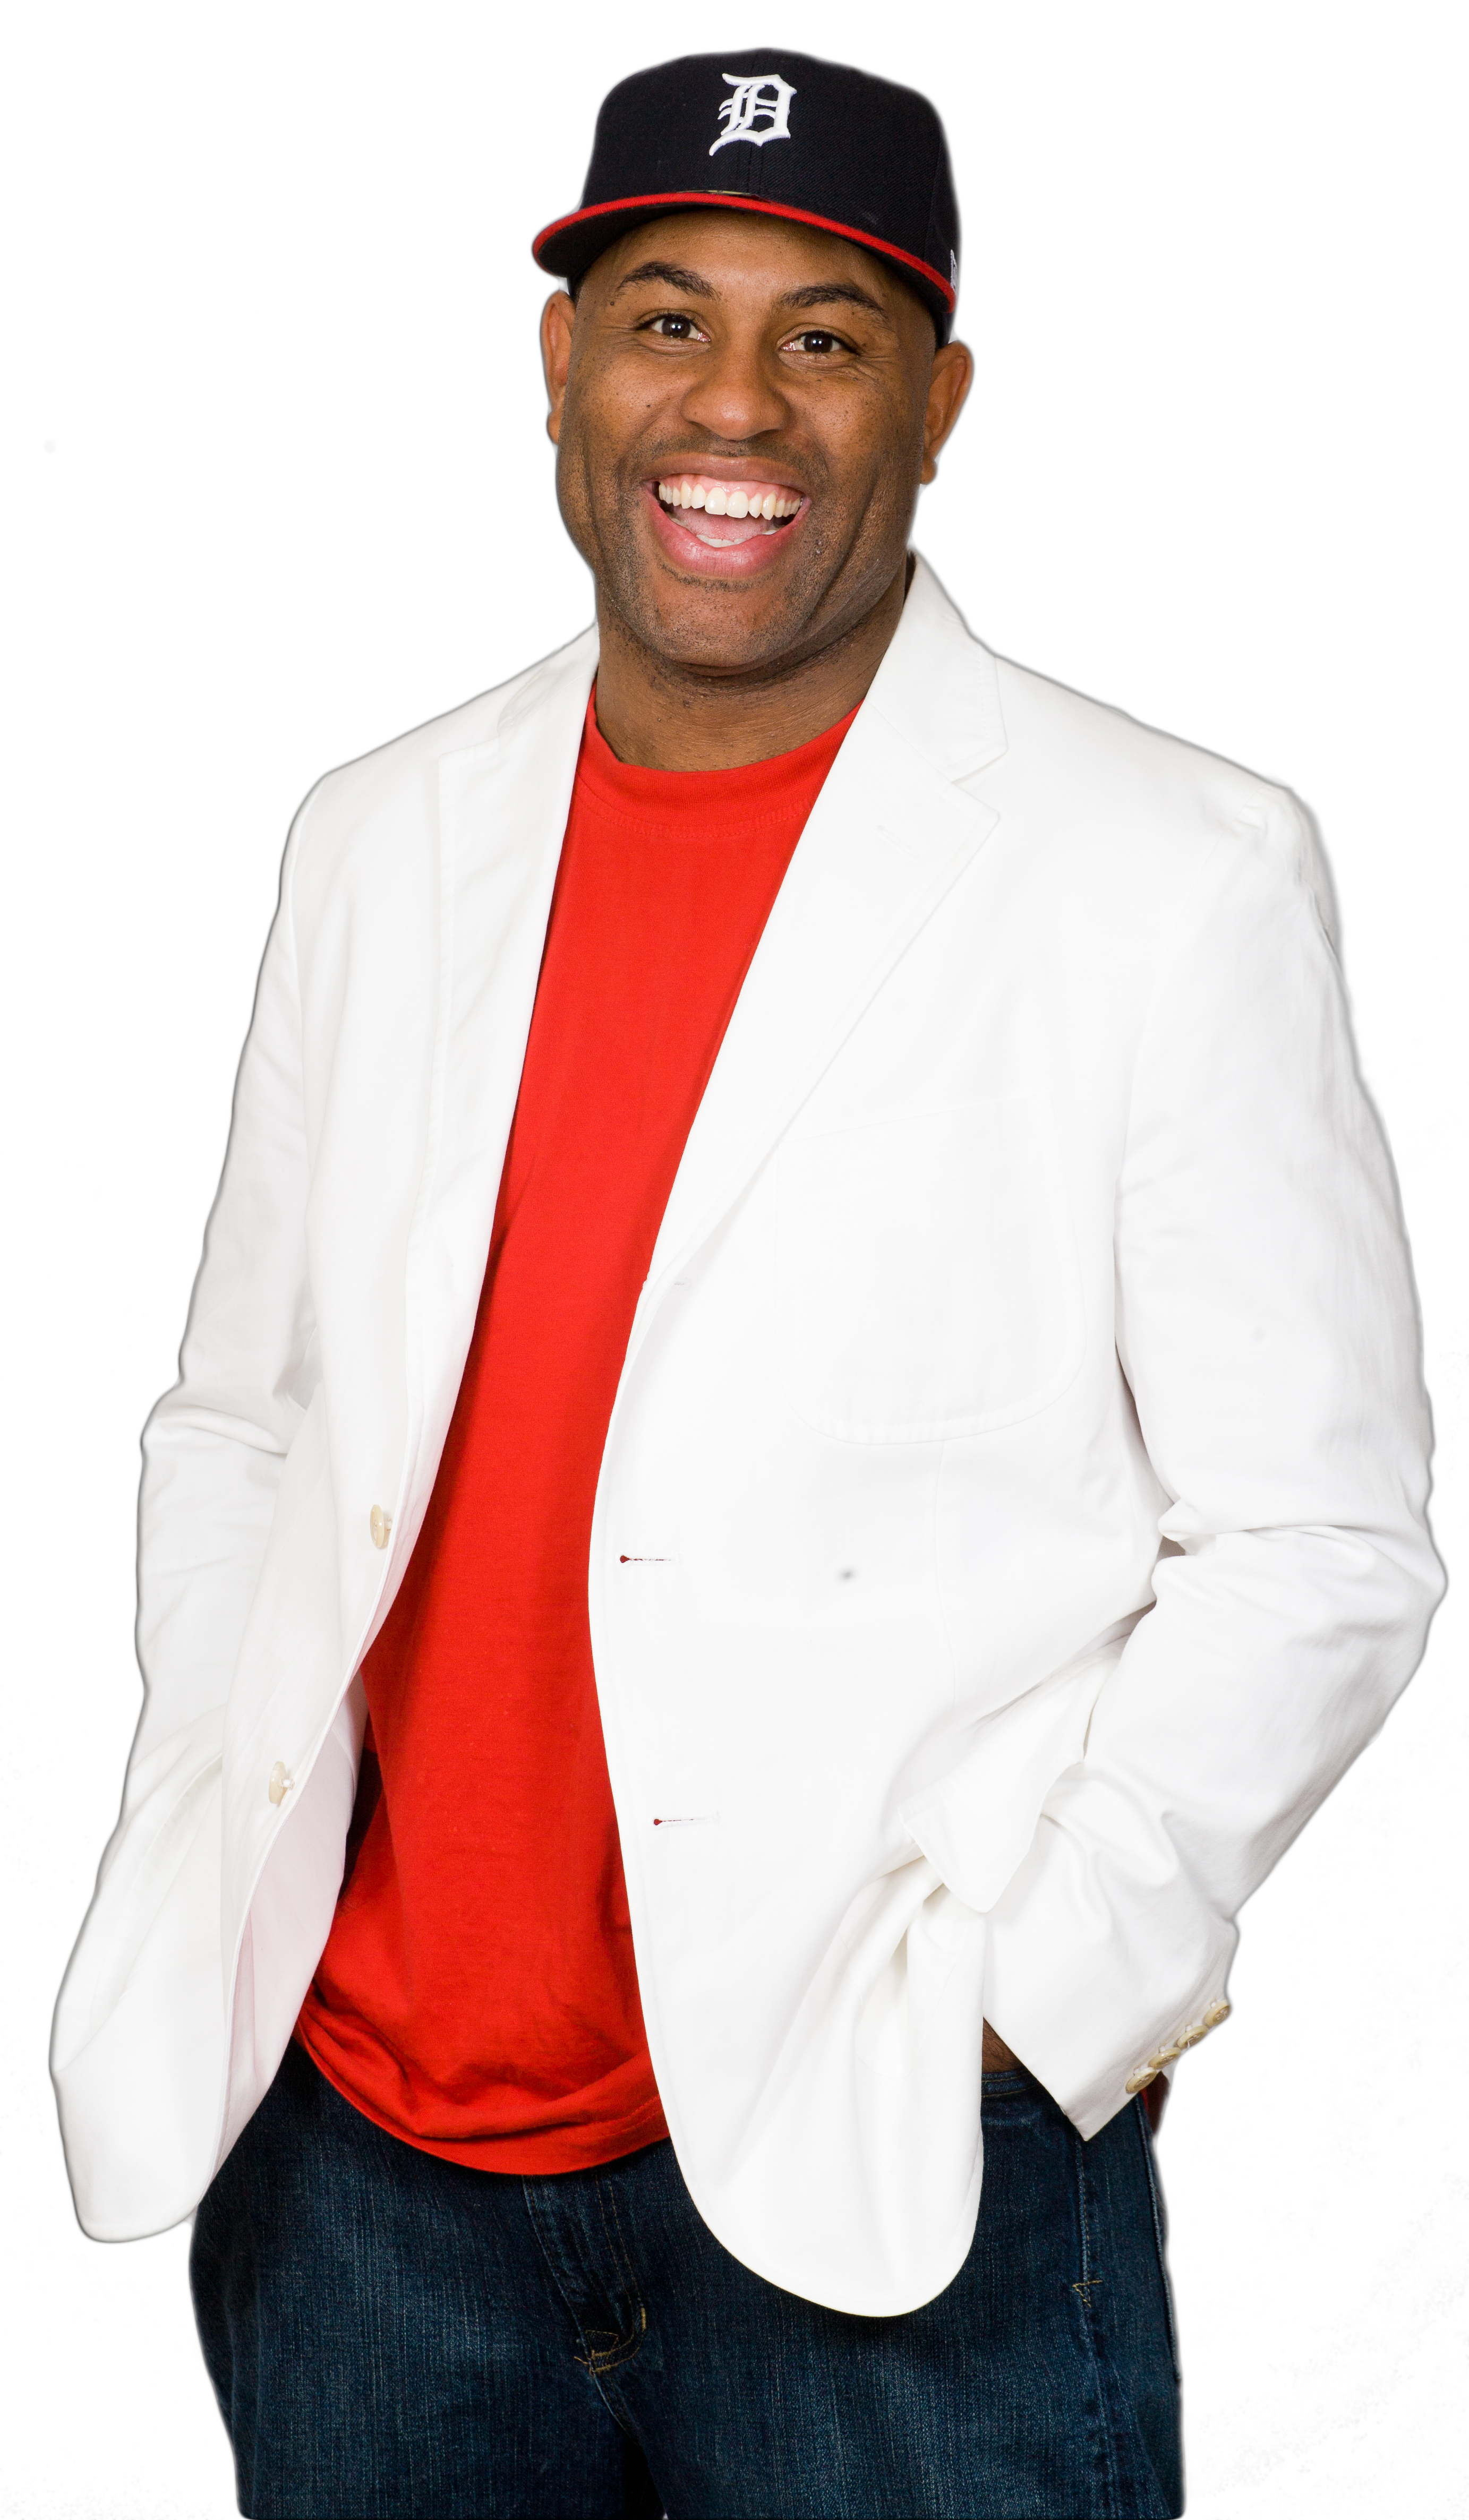 Eric Thomas Motivational Speaker Wikipedia